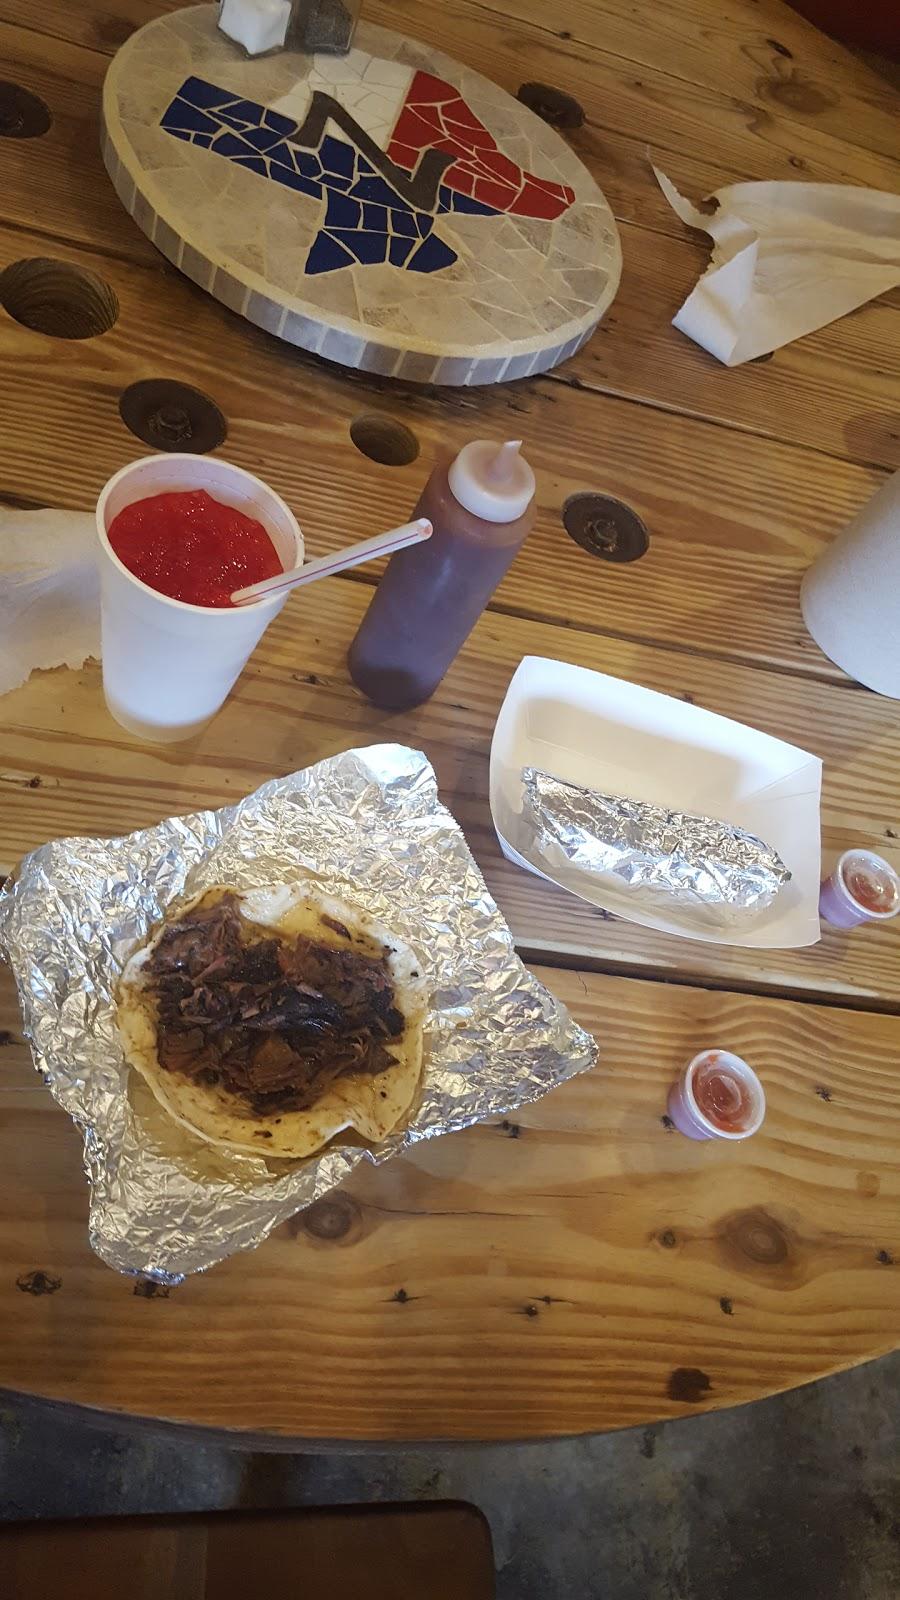 Ziggys Roadside BBQ - restaurant  | Photo 10 of 10 | Address: 120 U.S. Hwy 90 Street, Brackettville, TX 78832, USA | Phone: (830) 563-9293